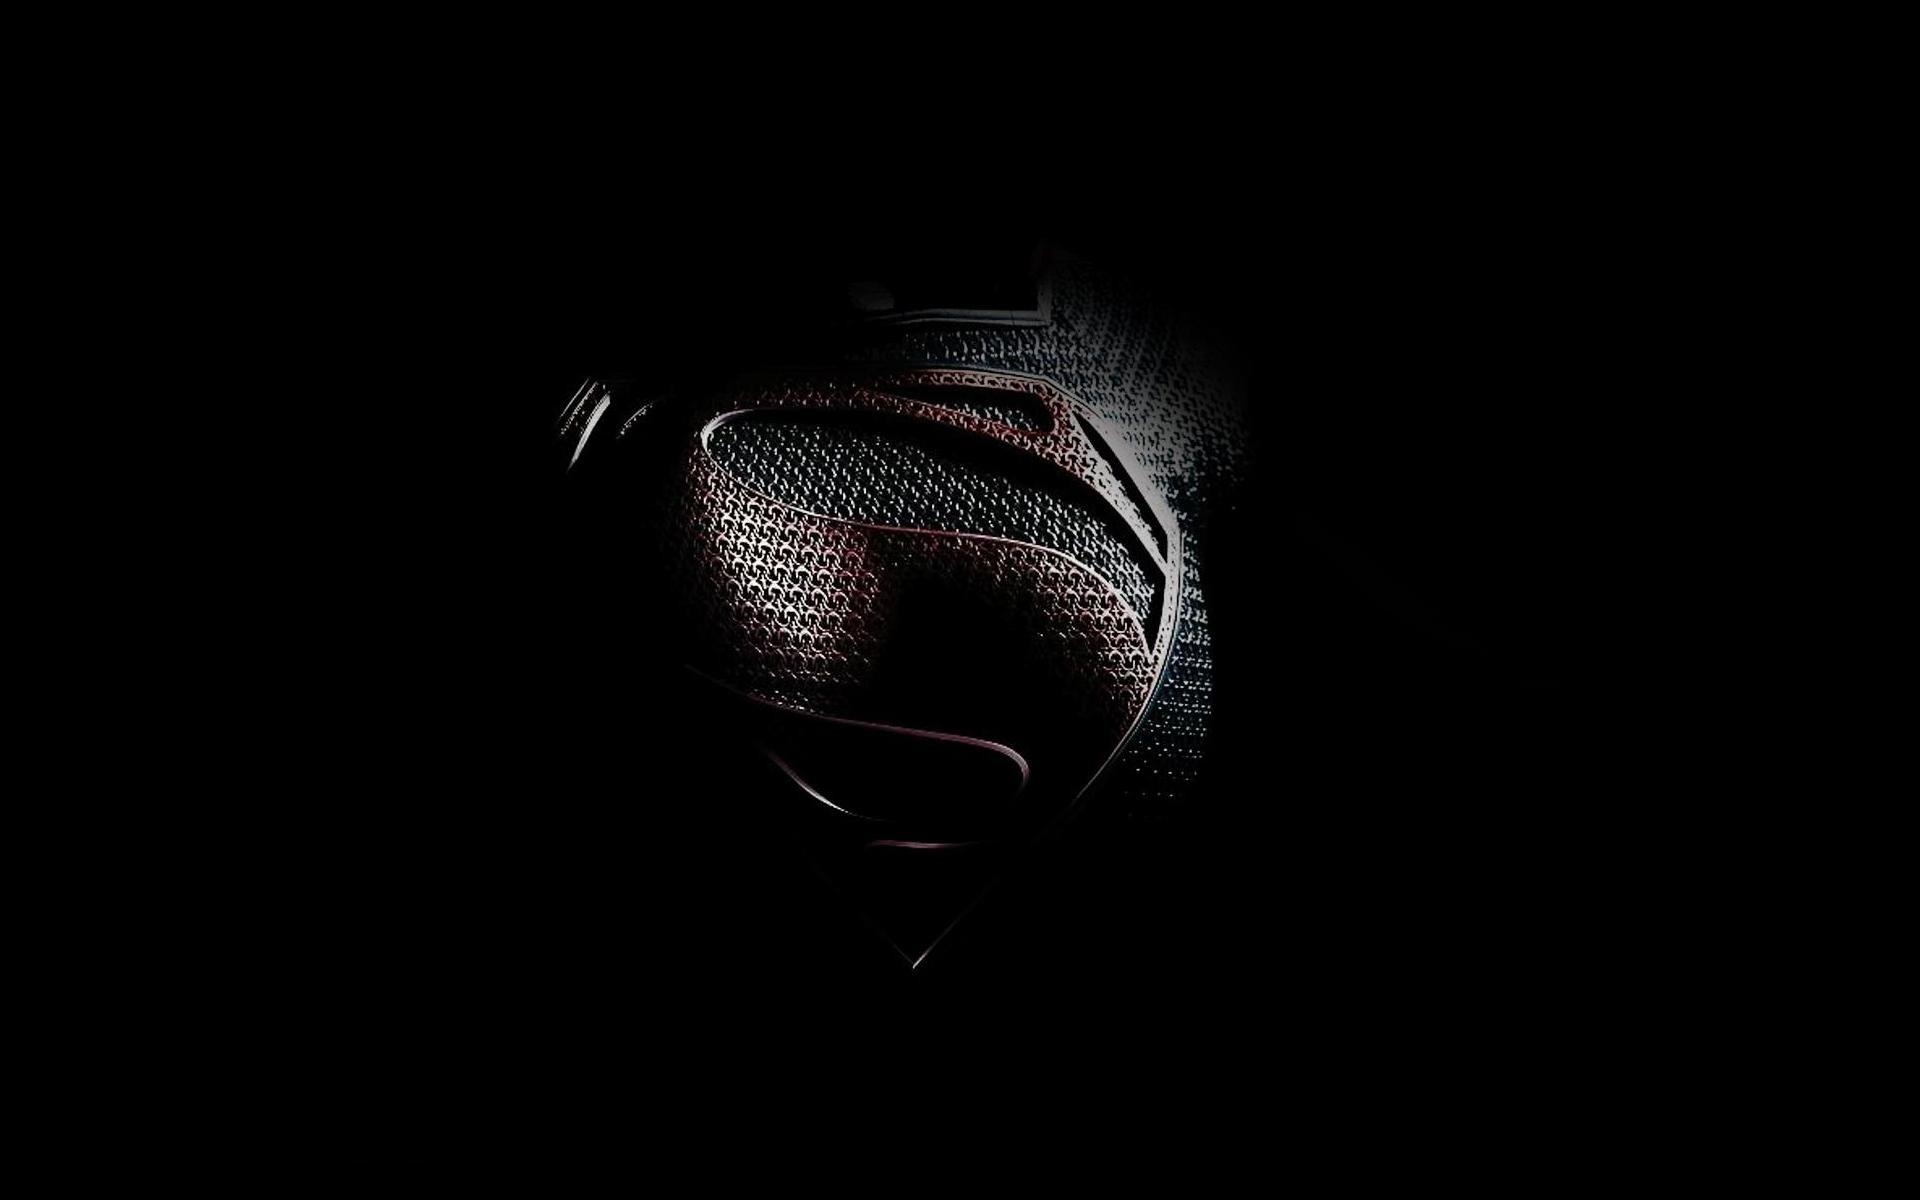 Superman Hd Wallpapers 1080P 206109 1920x1200